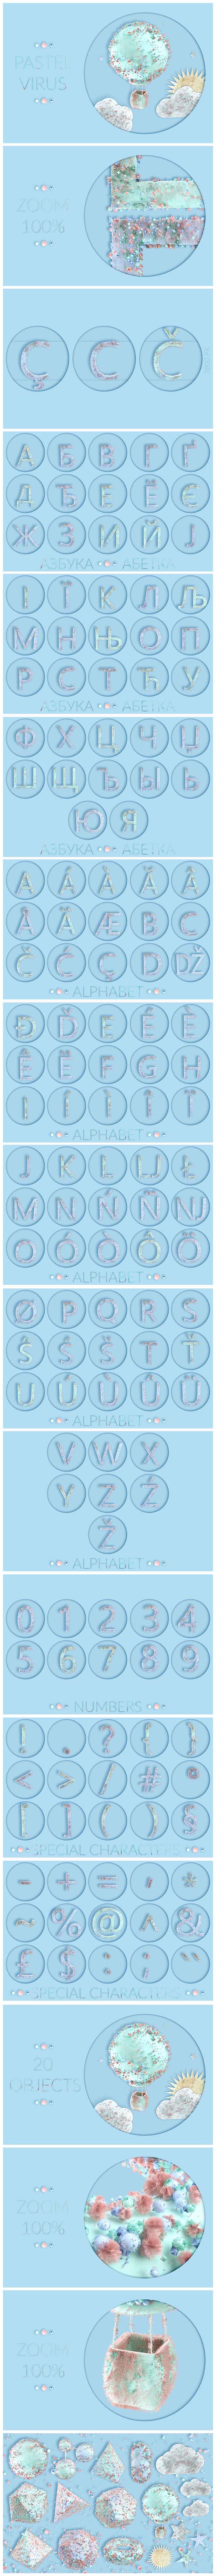 Huge Graphic Bundle Alphabet with 1000+ elements - $25 - PastelVirus min